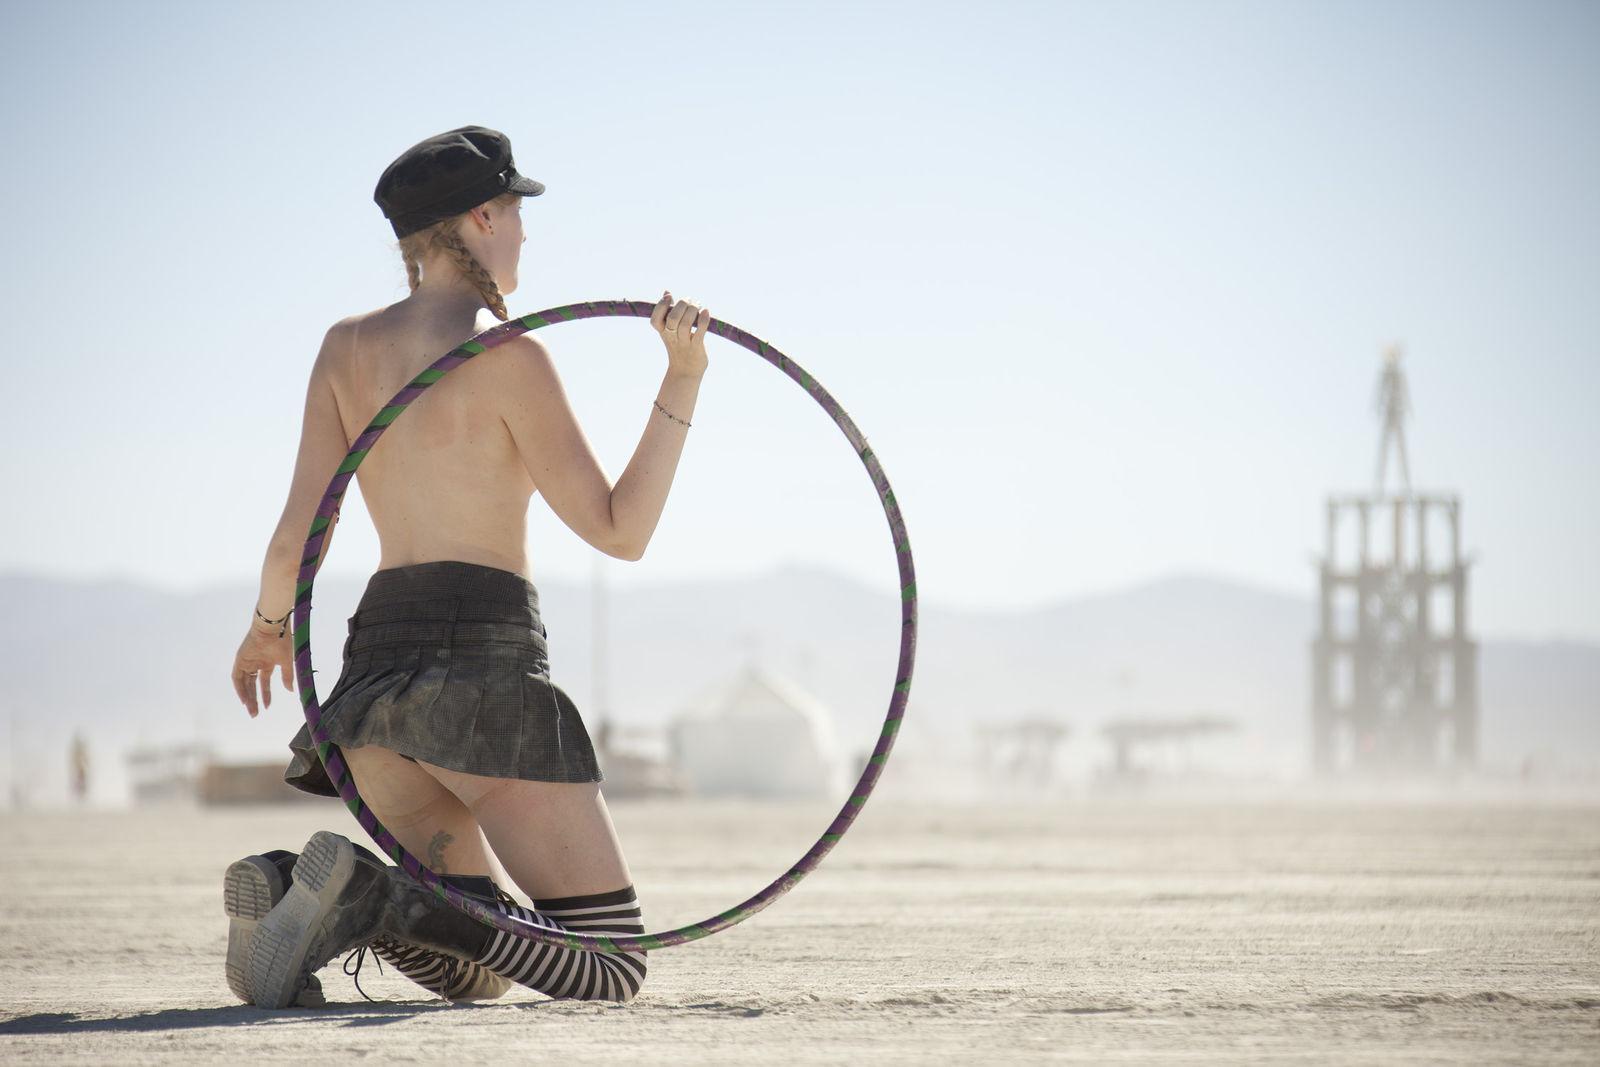 Pavel Antonov. Burning Man. City of Sand. _MG_9433 copy